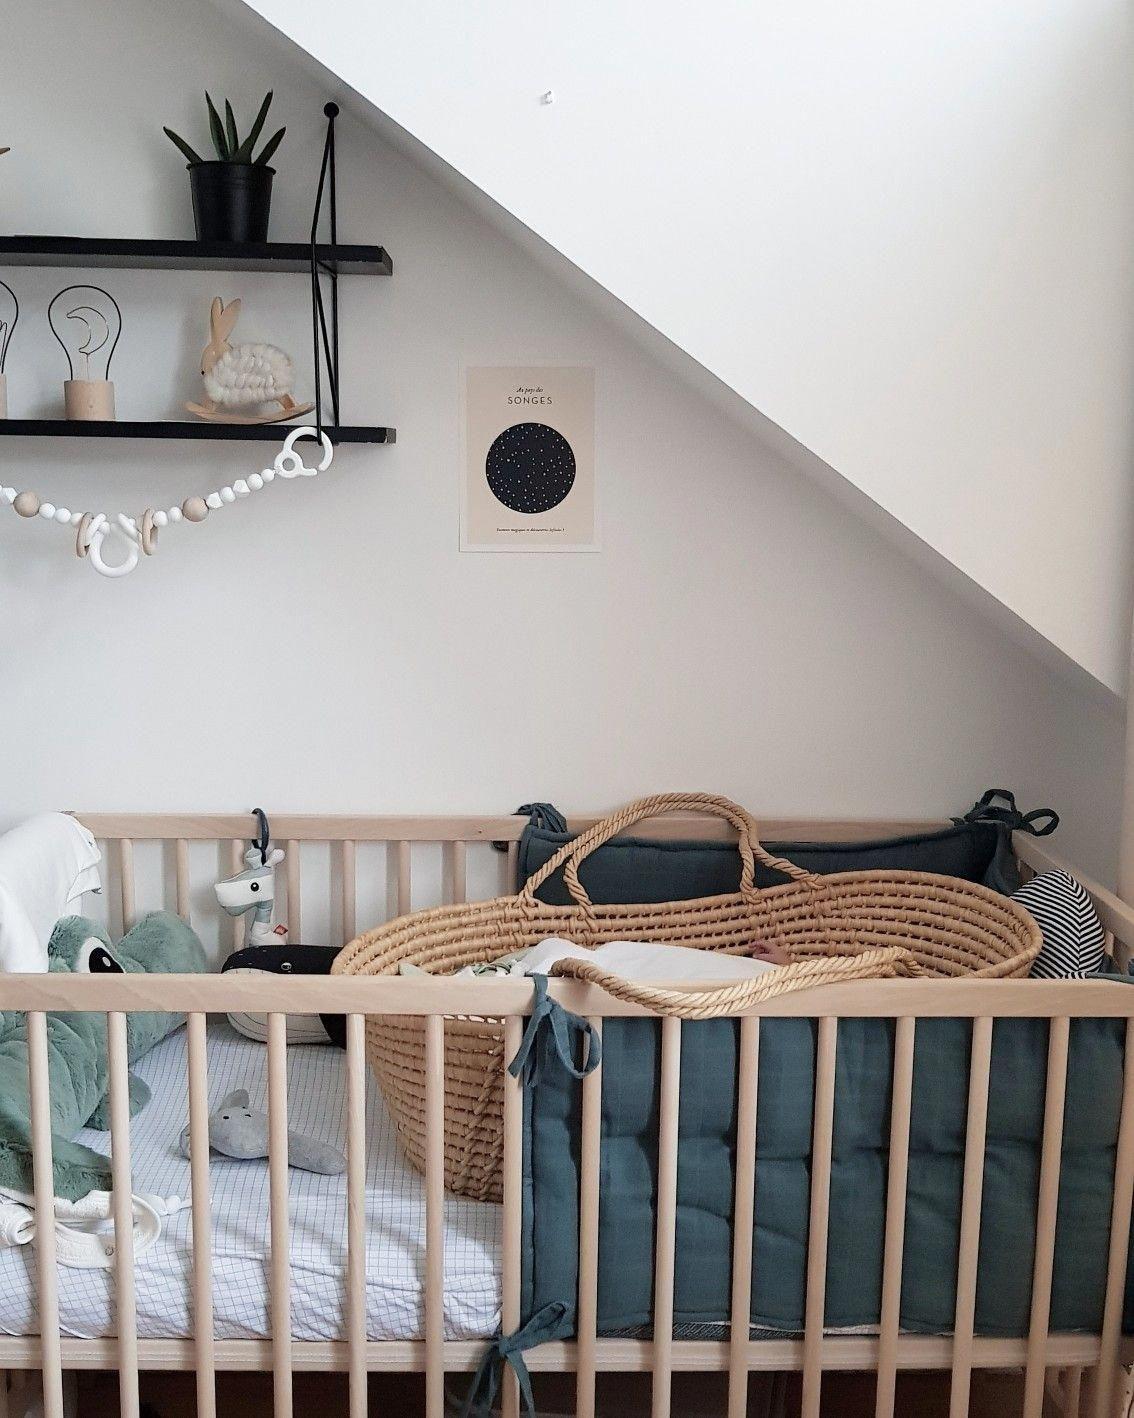 Pin By Aleksandra Turunen On Bbboo In 2020 Kids Room Inspiration